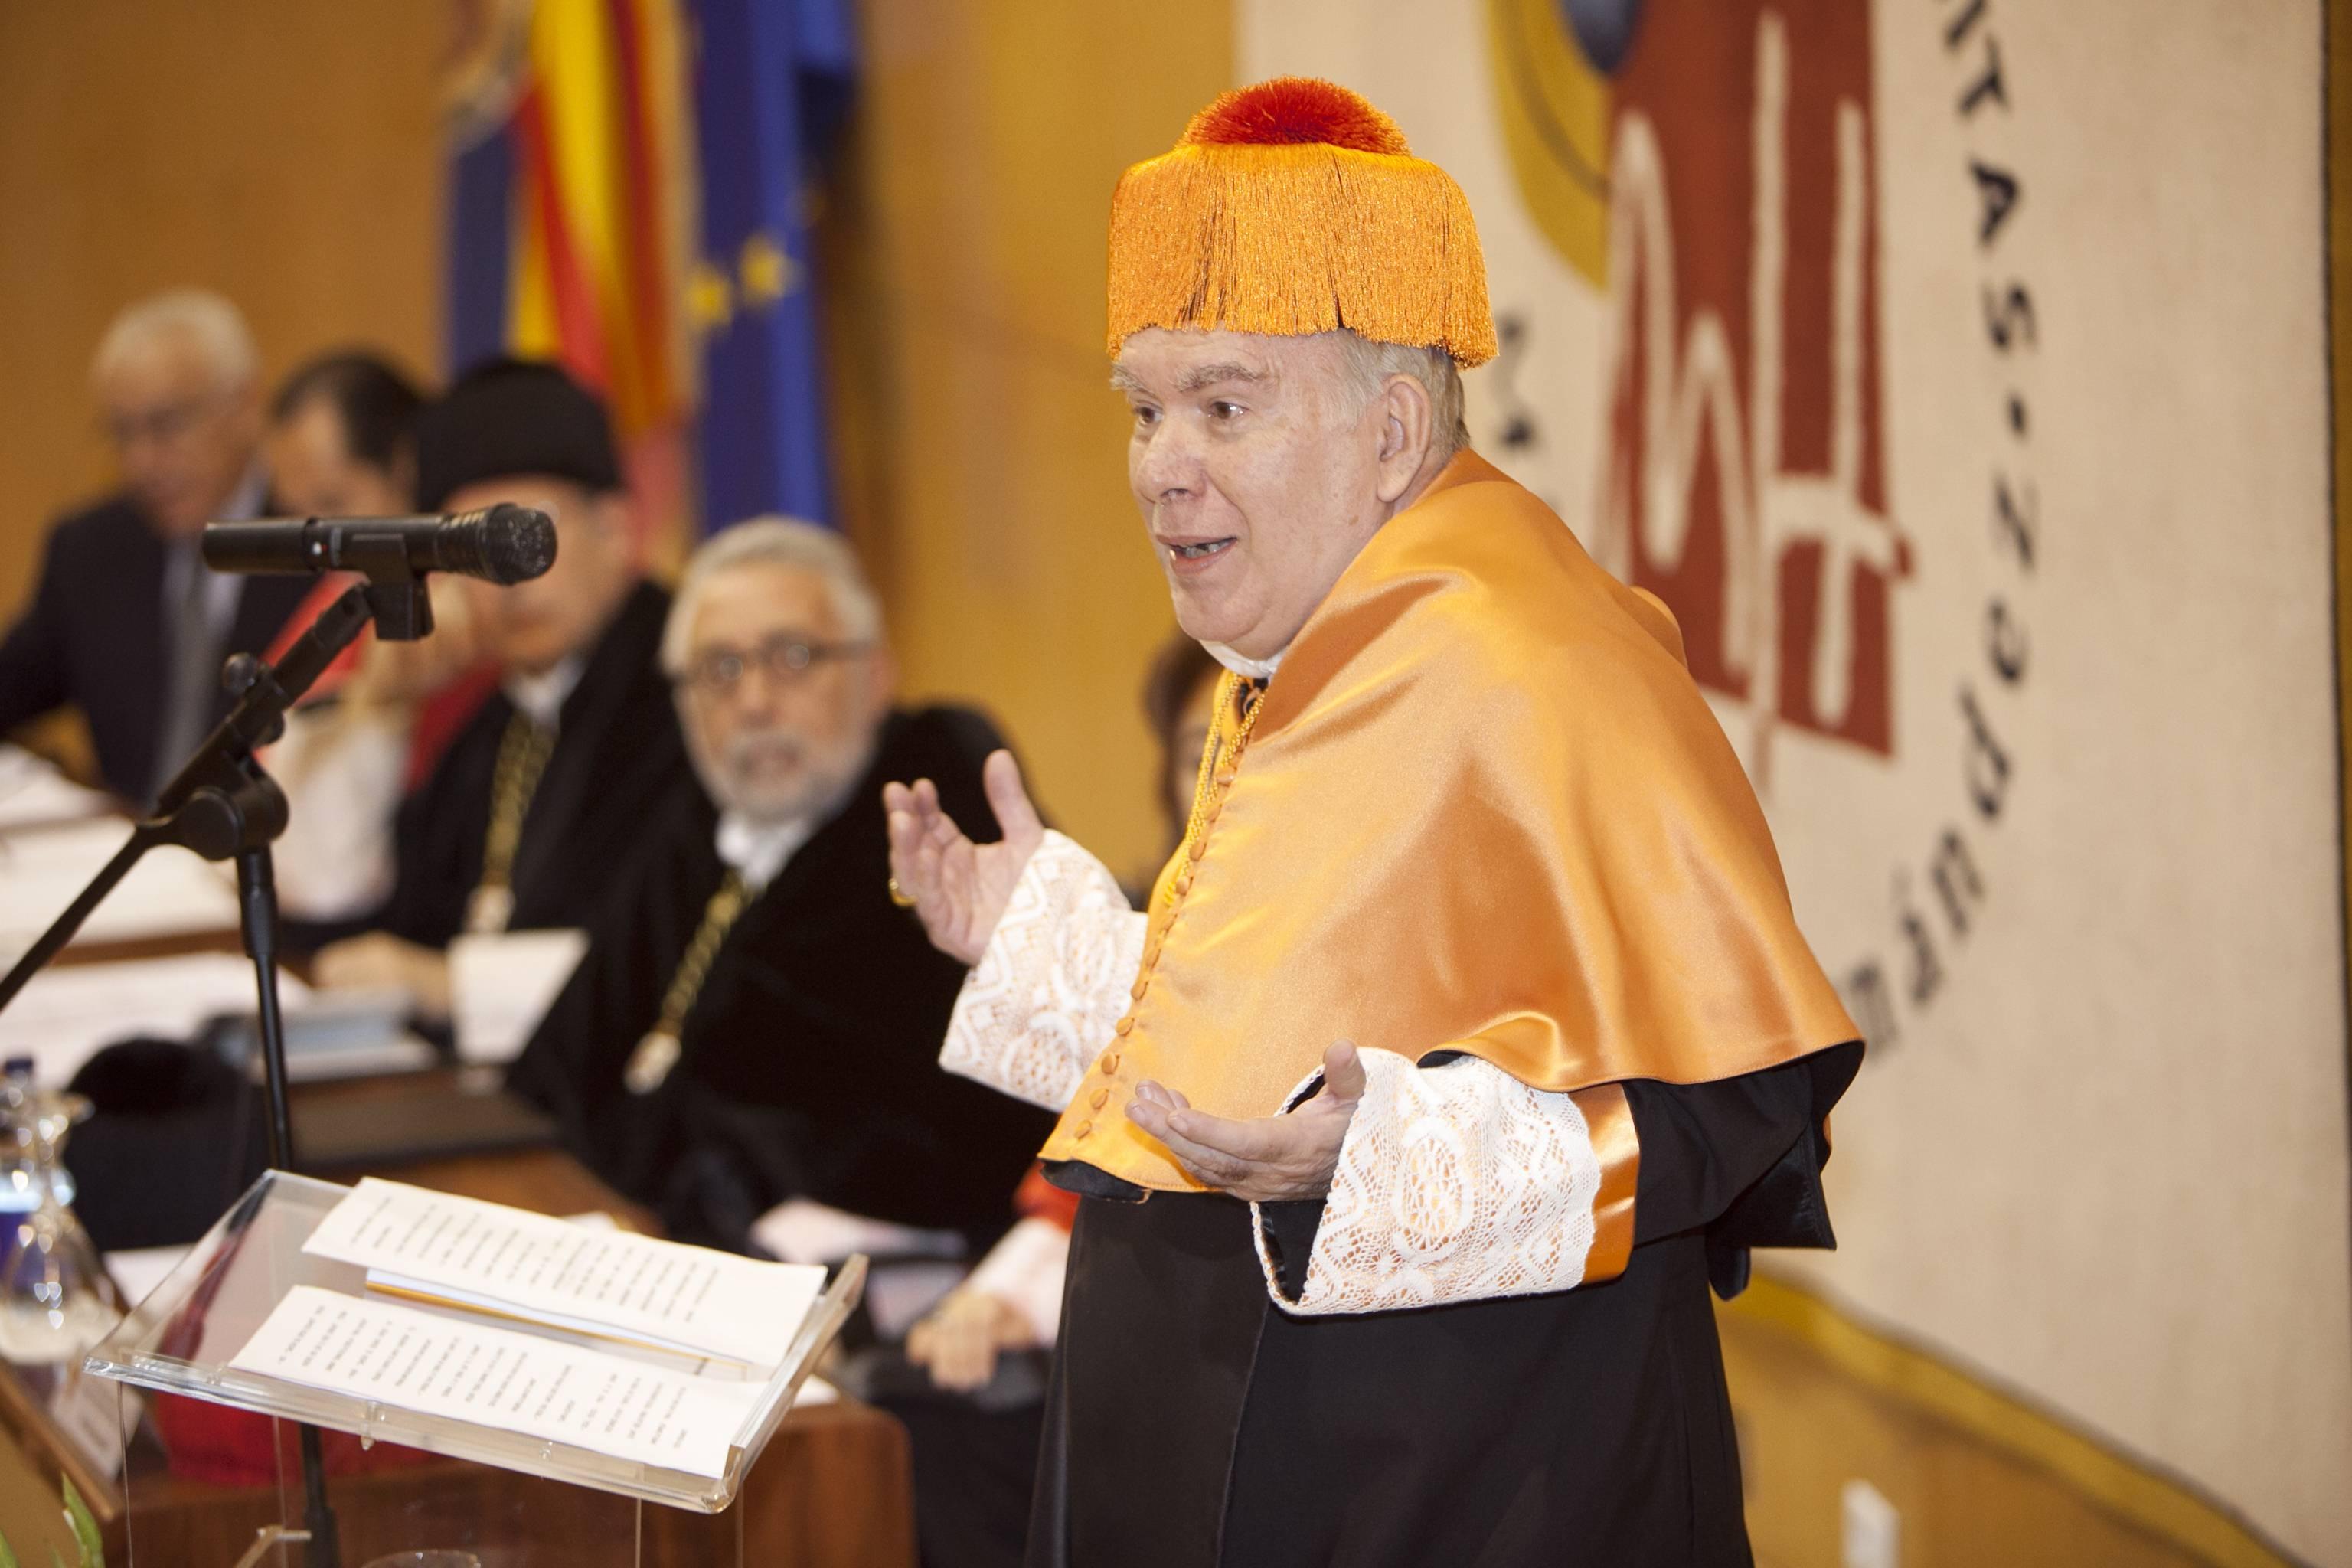 doctor-honoris-causa-luis-gamir_mg_0856.jpg